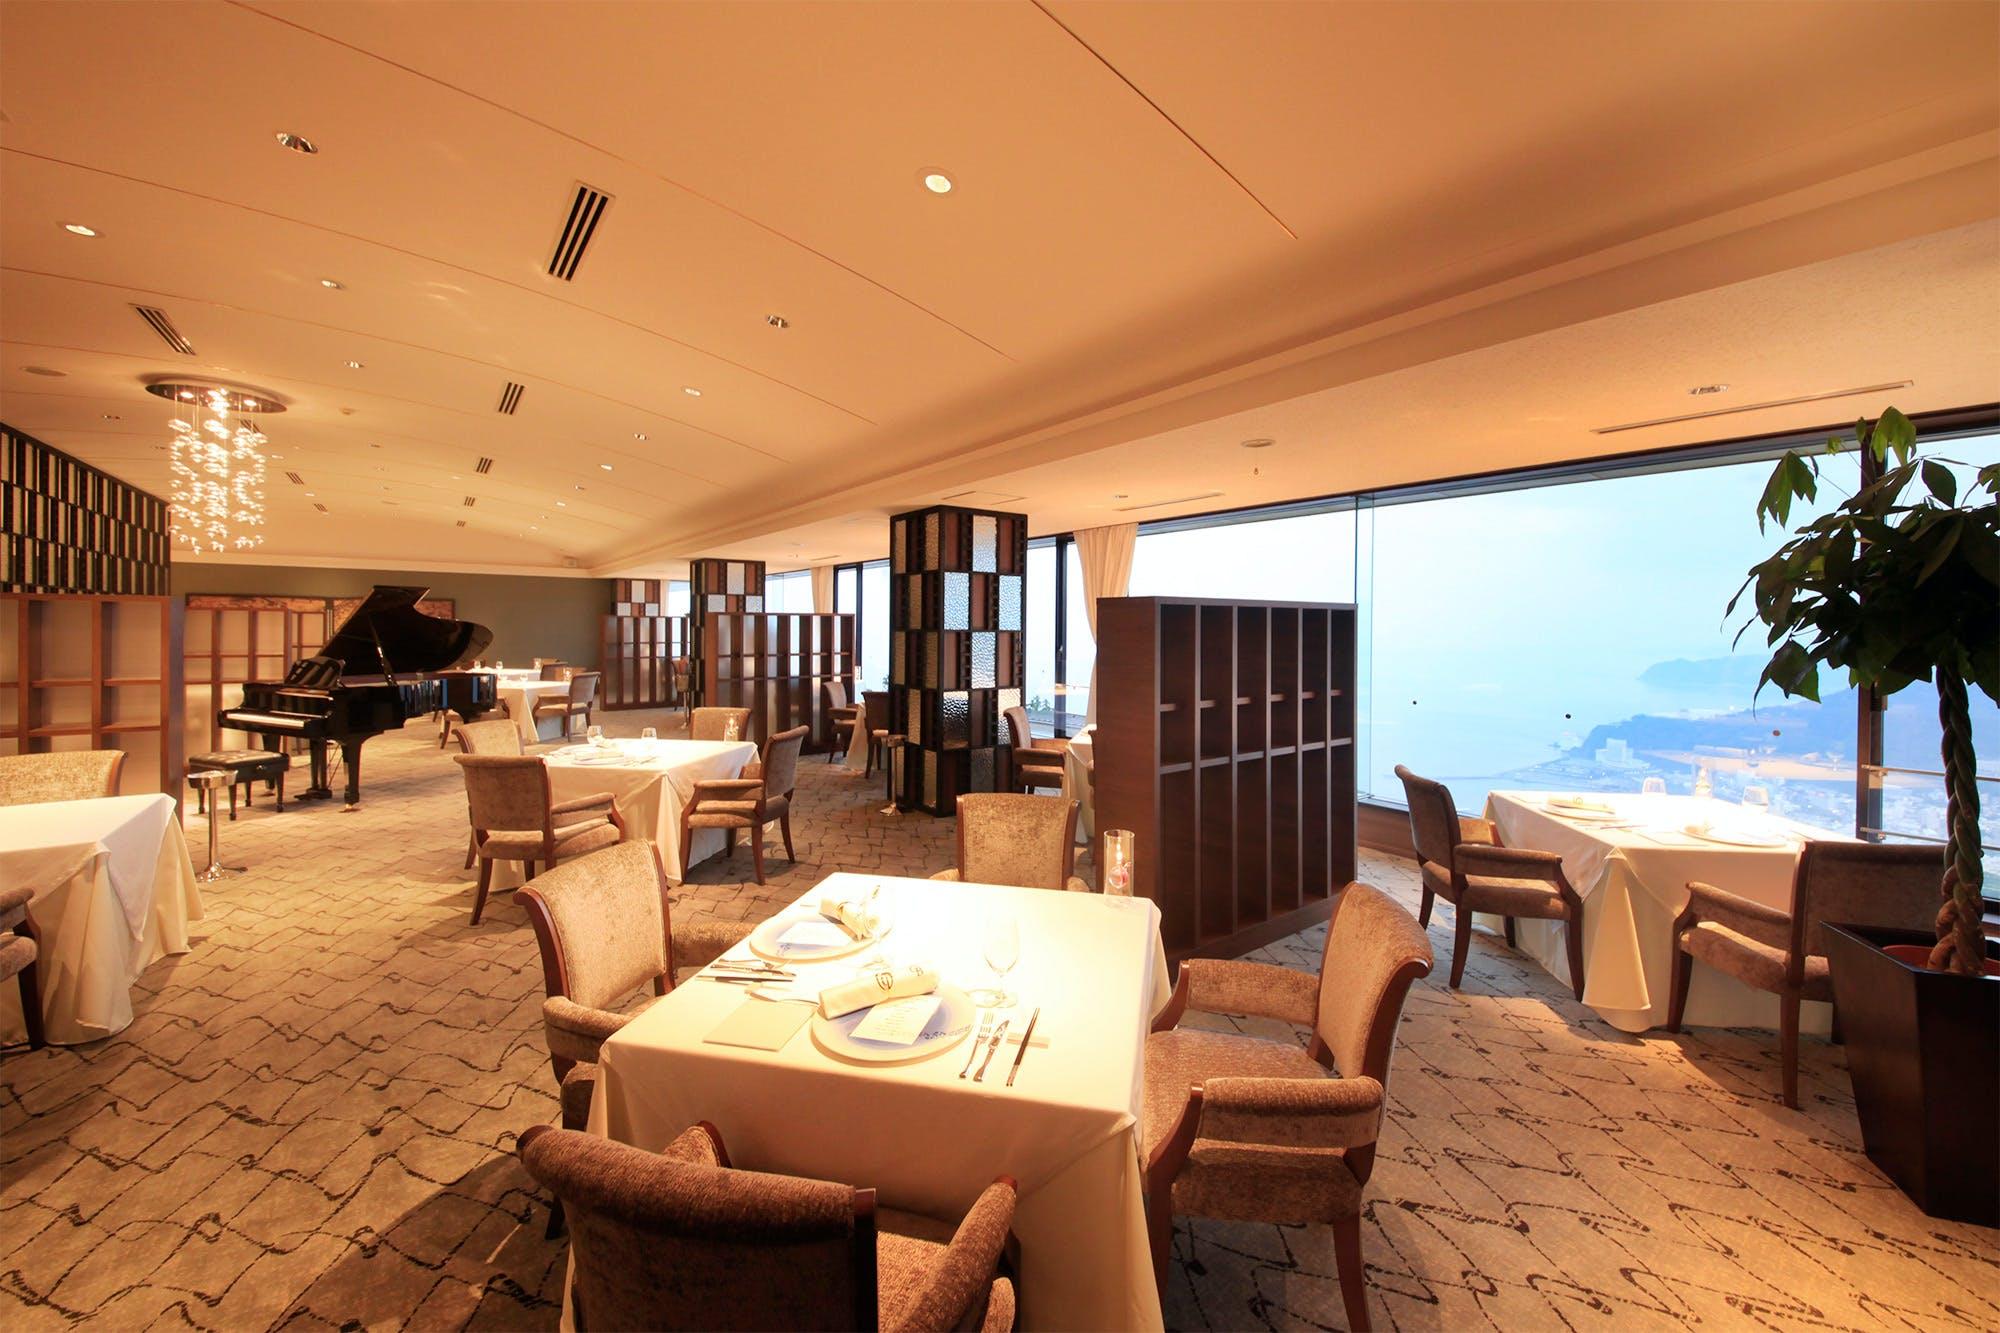 Main Dining 風雅/ホテルグランバッハ熱海クレッシェンド